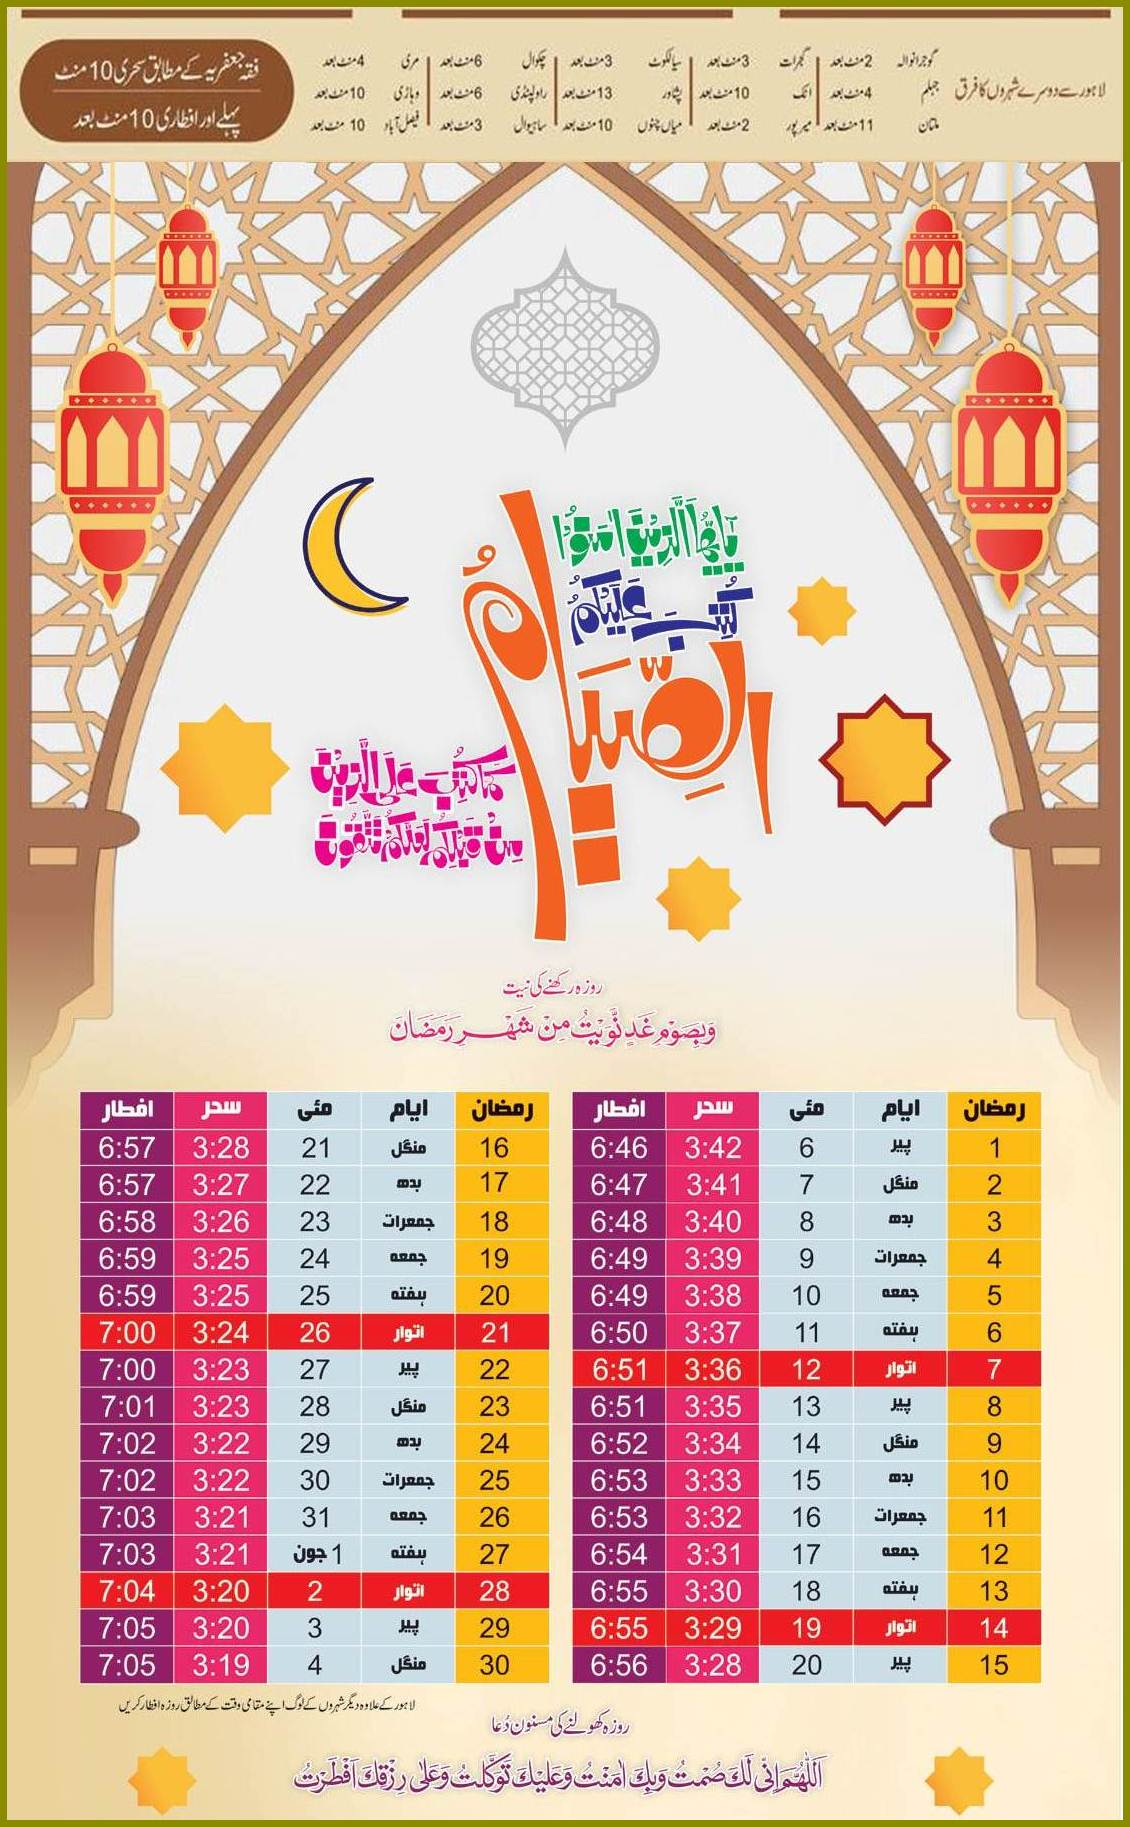 Ramadan Schedule 2019 Pakistan, Ramazan Calendar 1440 Hijri (Shia-Sunni)